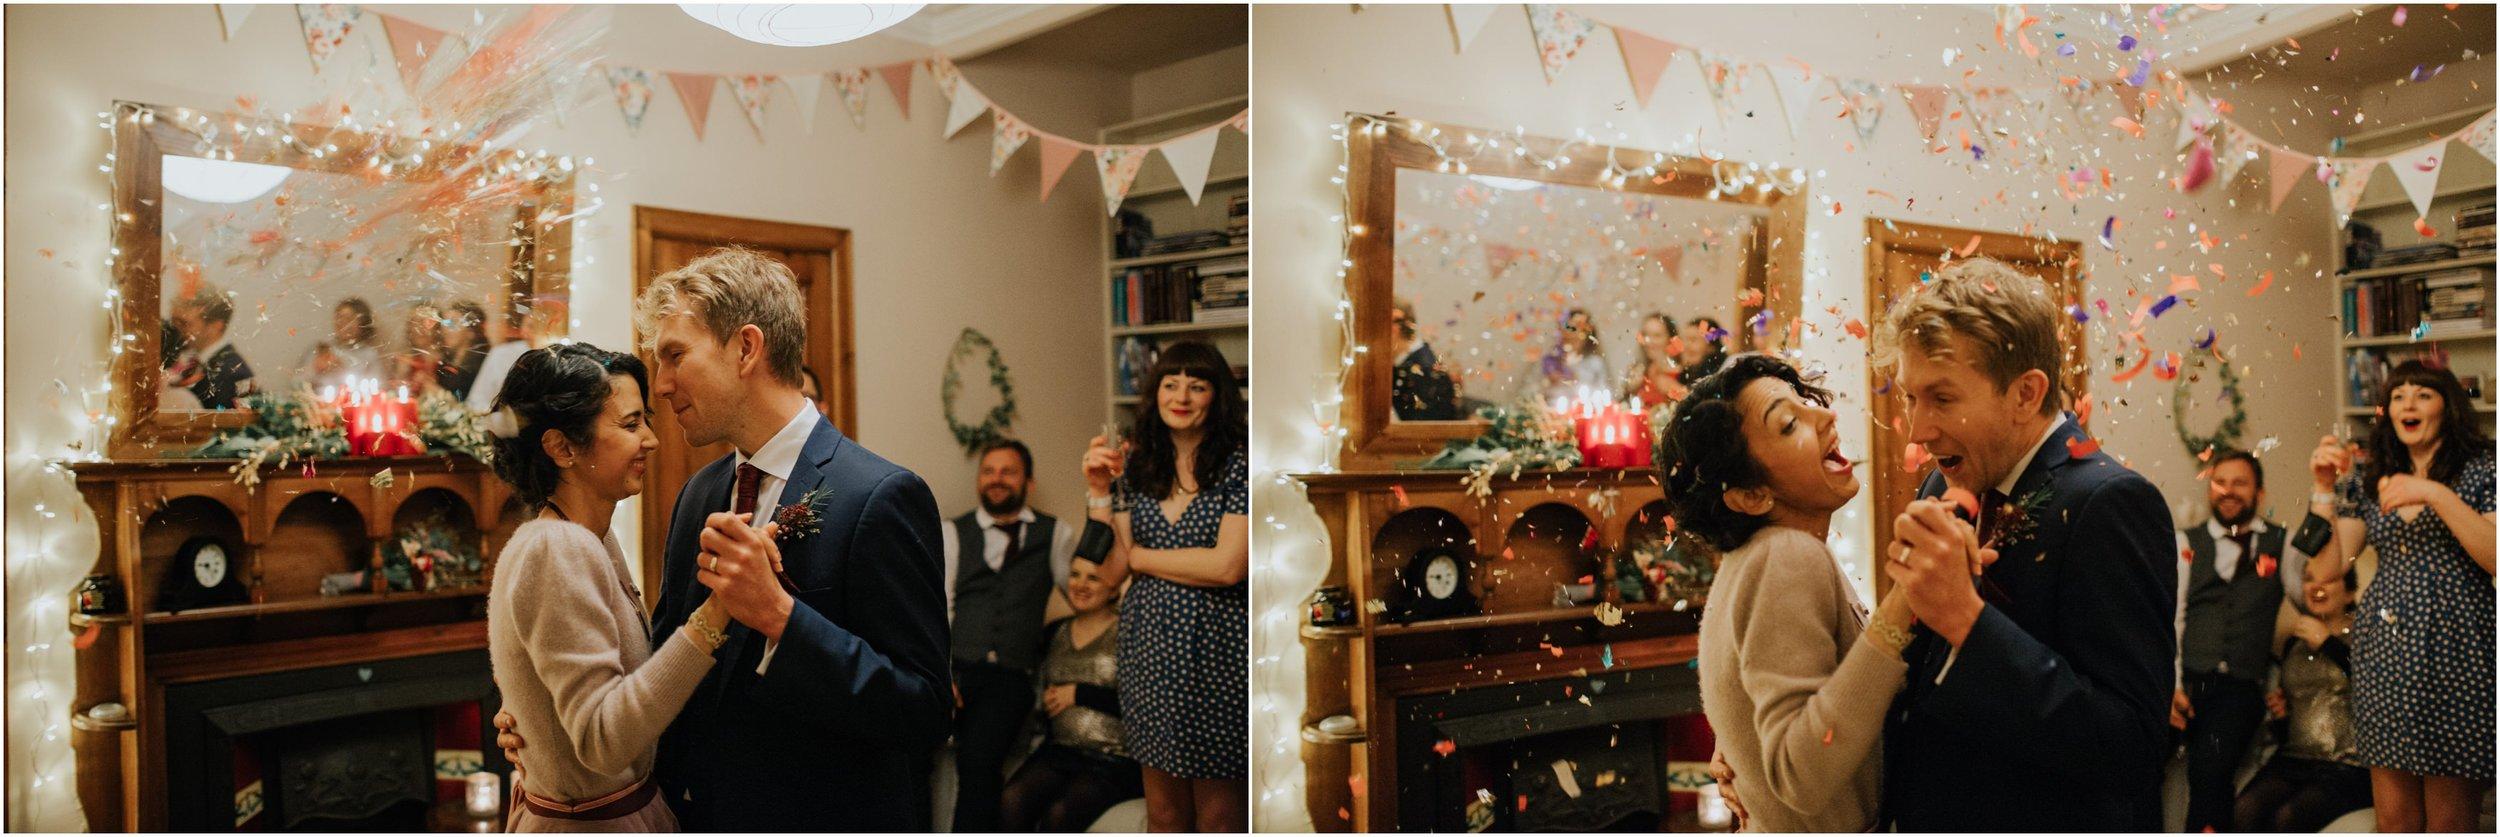 Photography 78 - Glasgow Wedding Photographer - Mike & Karol - Ubiquitous Chip Ashton Lane_0074.jpg